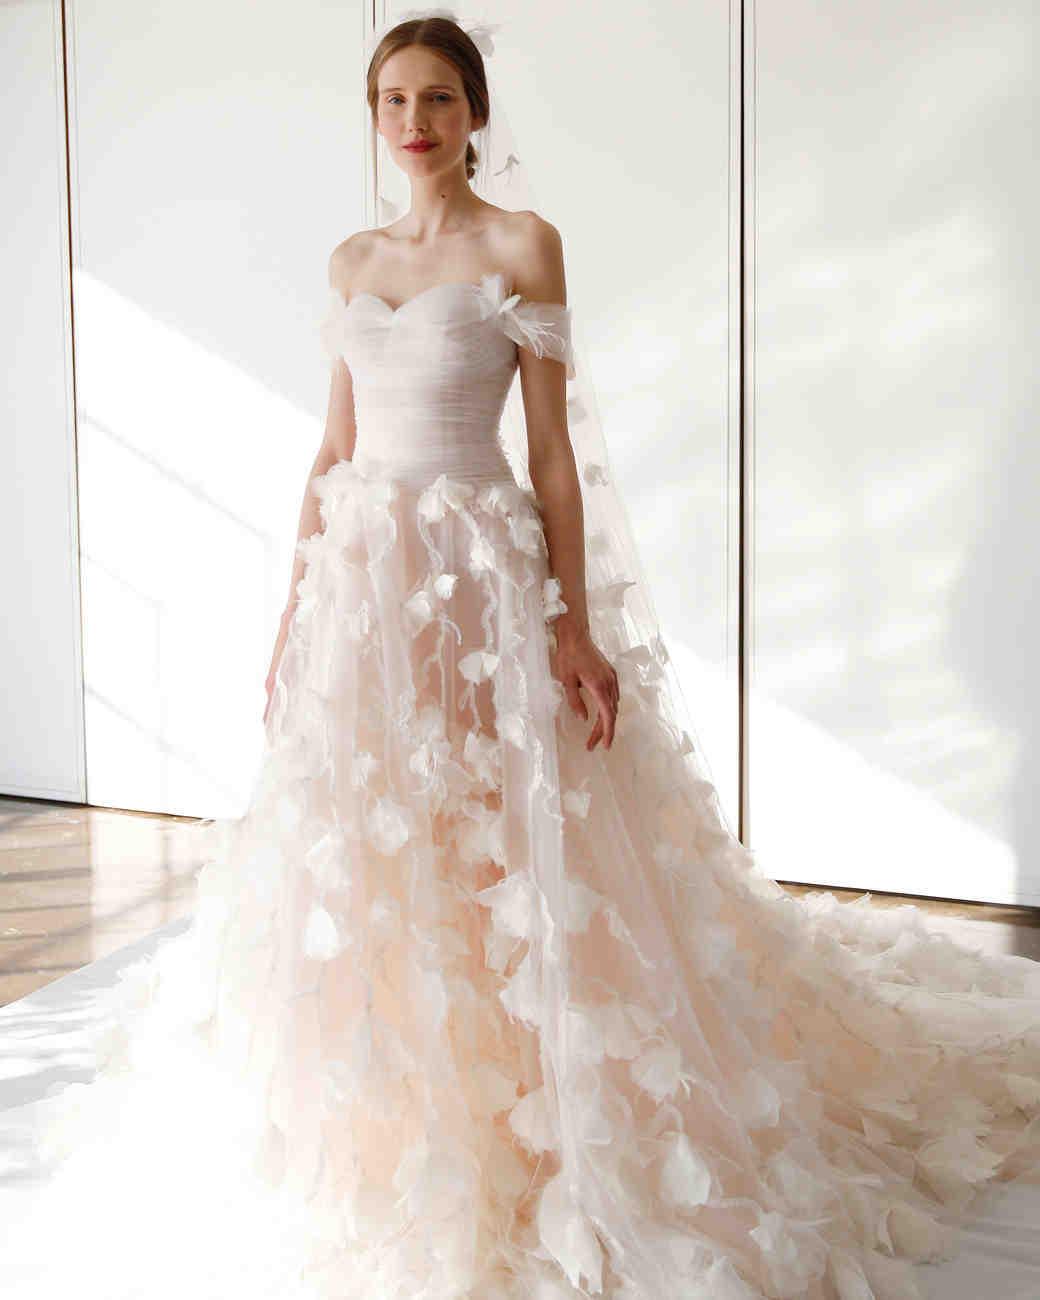 wedding dresses catalogues - Vatoz.atozdevelopment.co